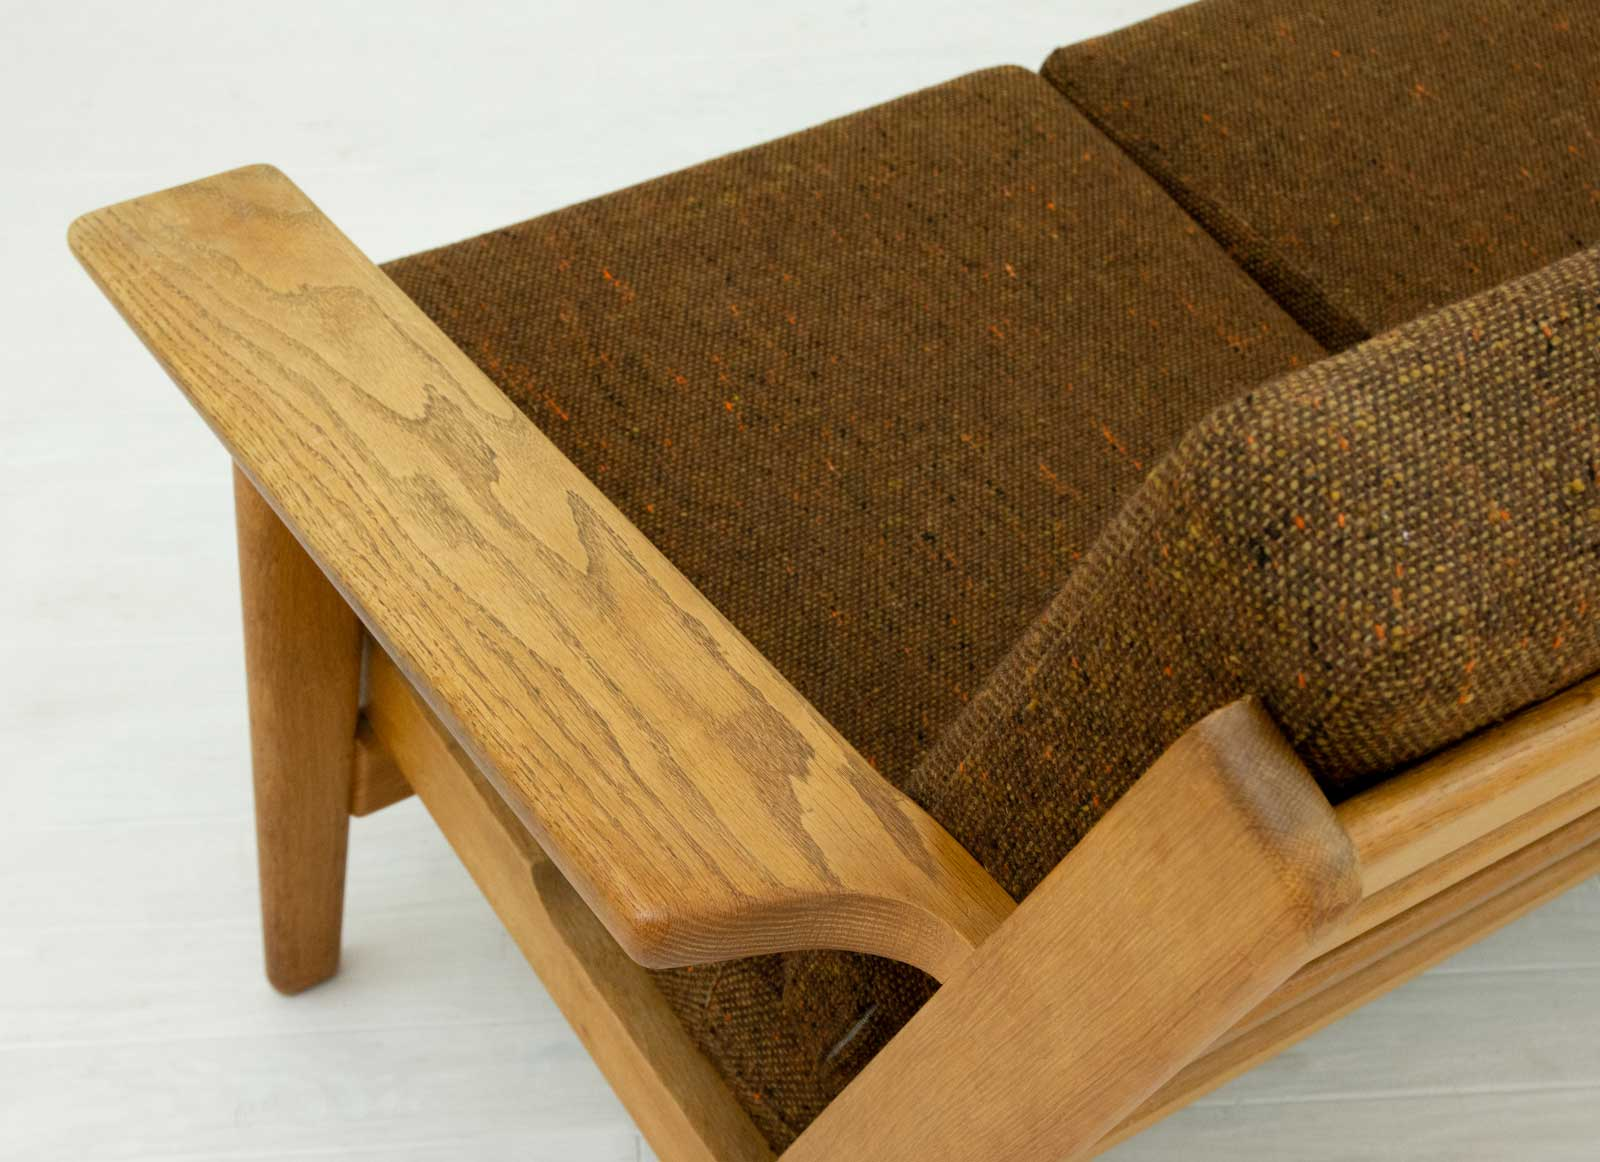 GE290 3seaters Sofa by Hans J Wegner (fabric)